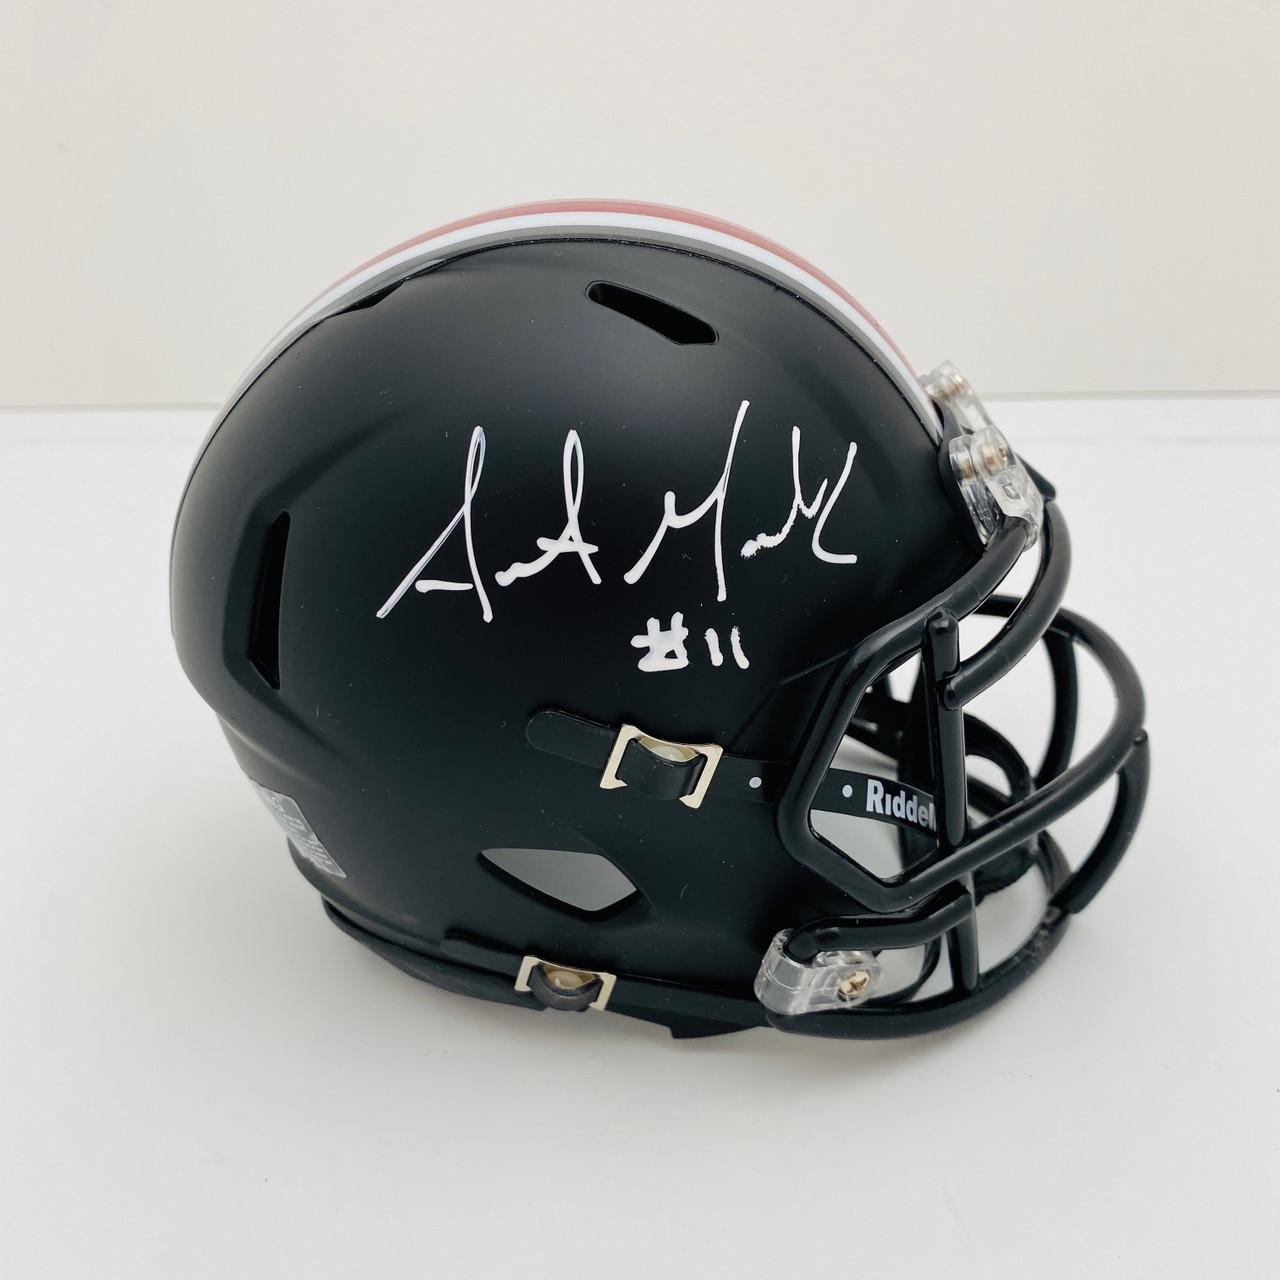 Austin Mack Ohio State Buckeyes Autographed Black Mini Helmet - Certified Authentic